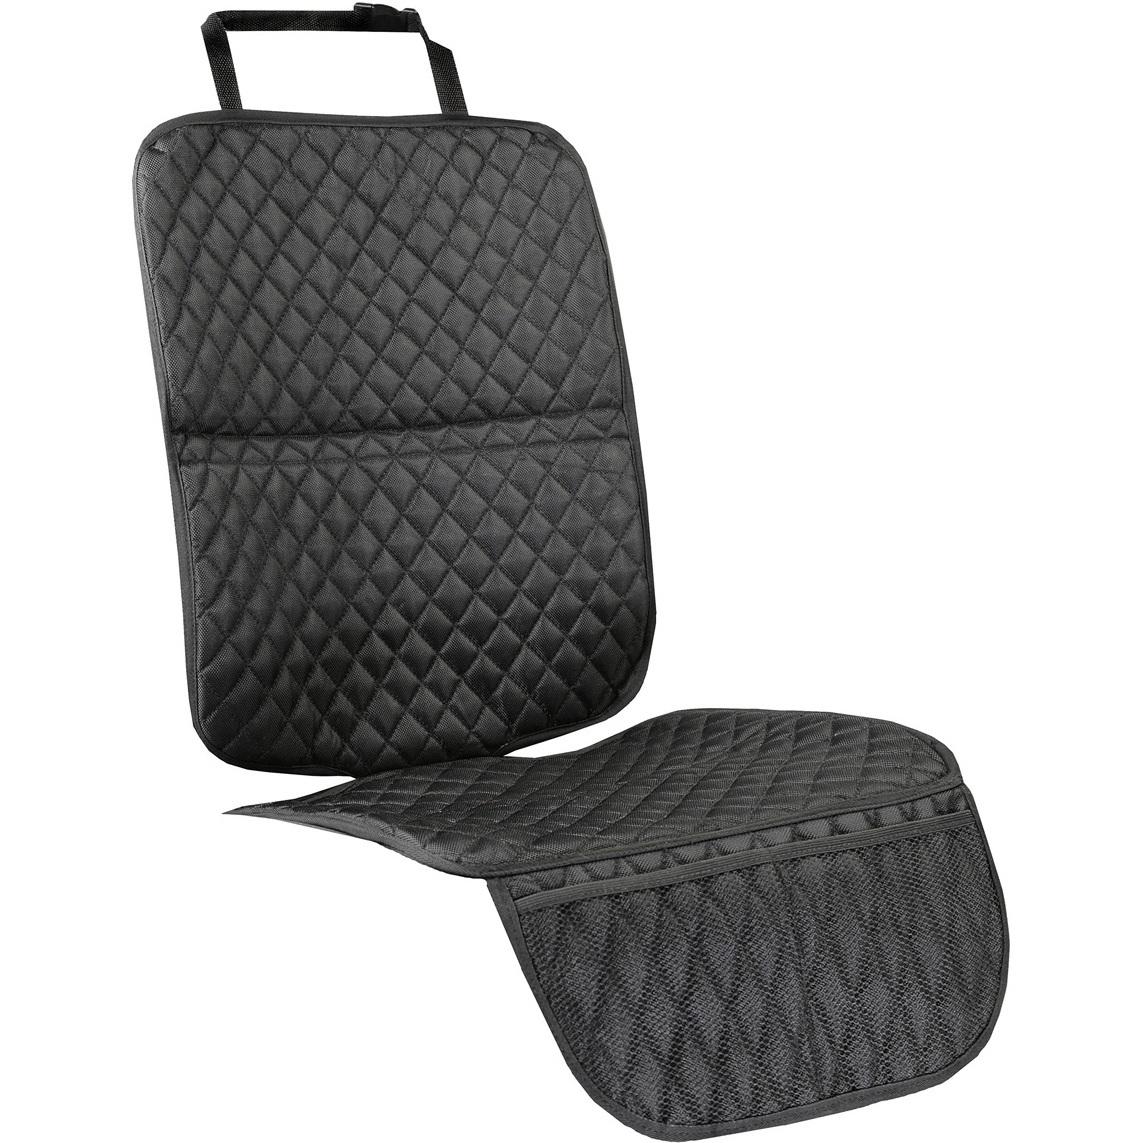 Protectie scaun auto Tuloko TL0011 imagine